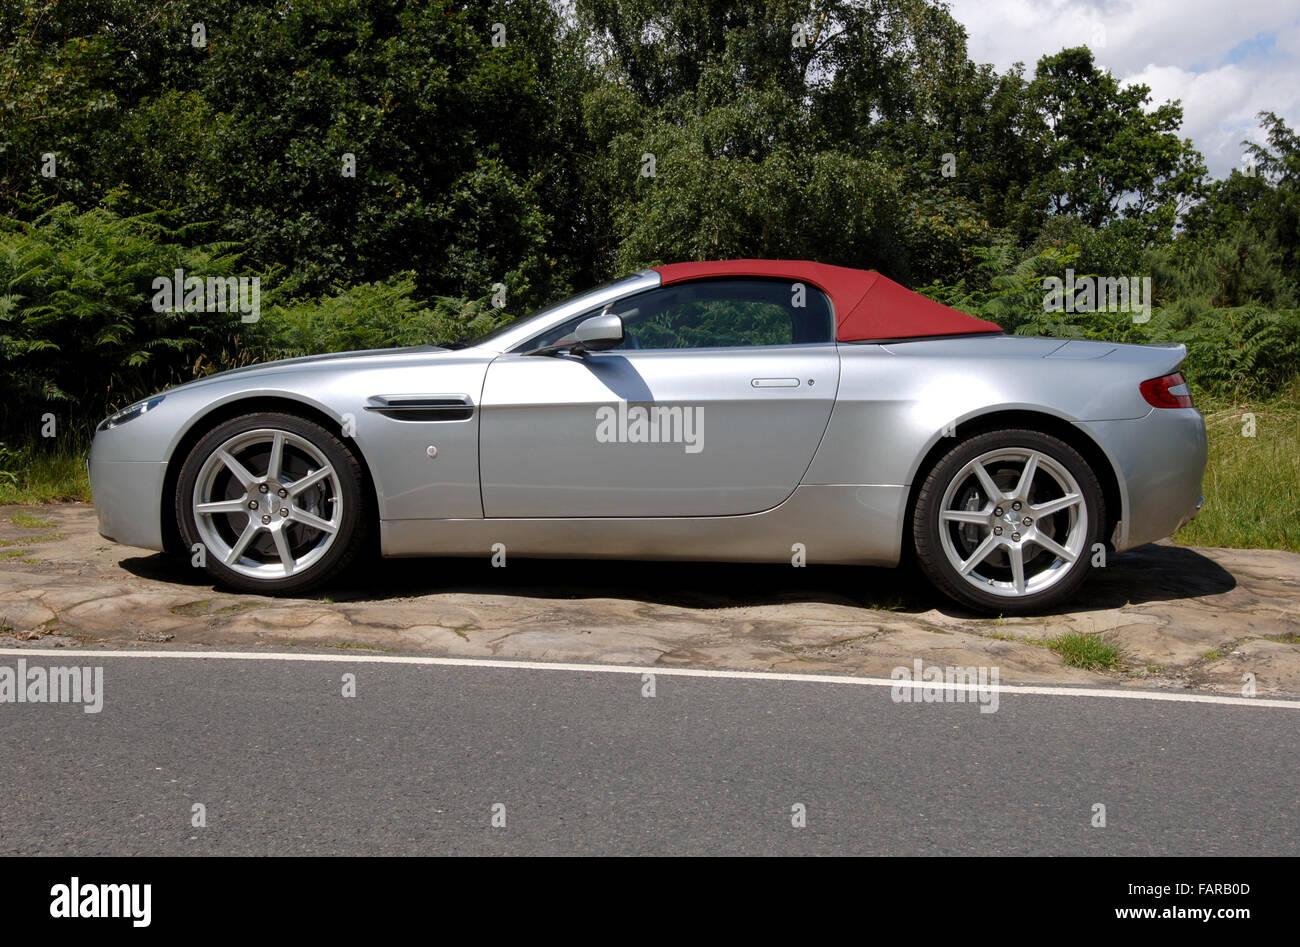 2007 Aston Martin Vantage Super Cabrio Stockfotografie Alamy